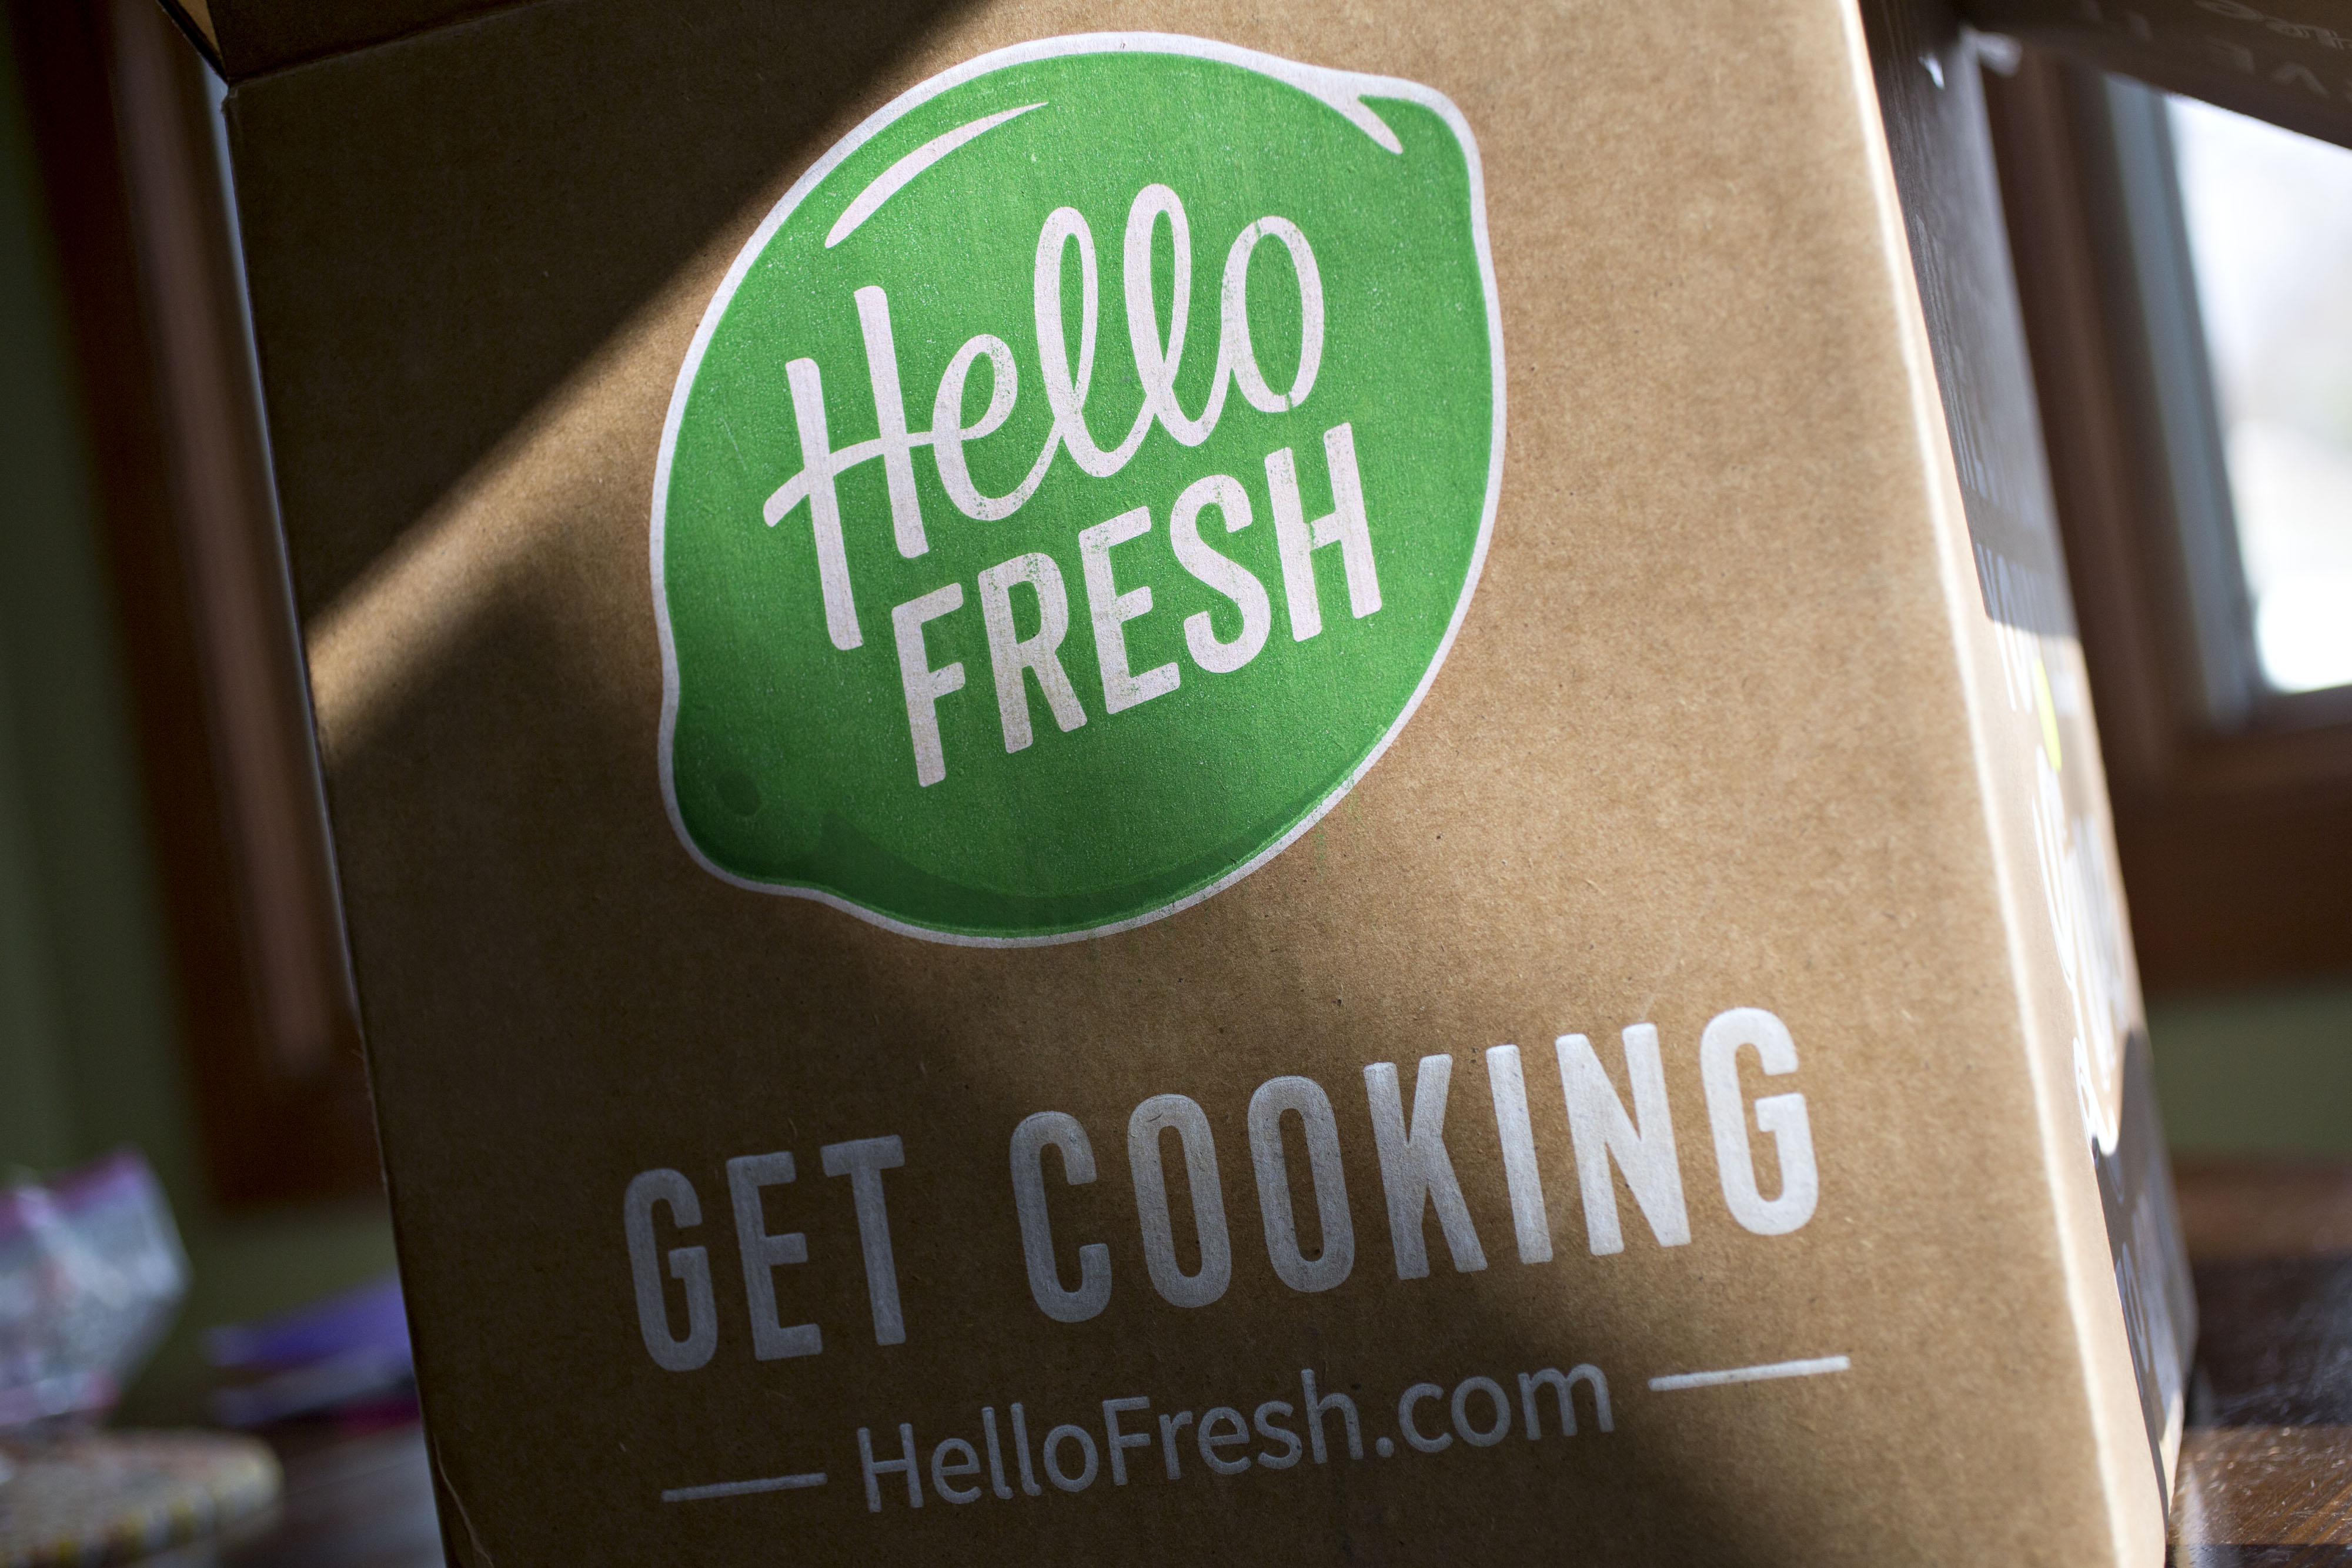 Cardboard box with green HelloFresh logo on it in dappled light